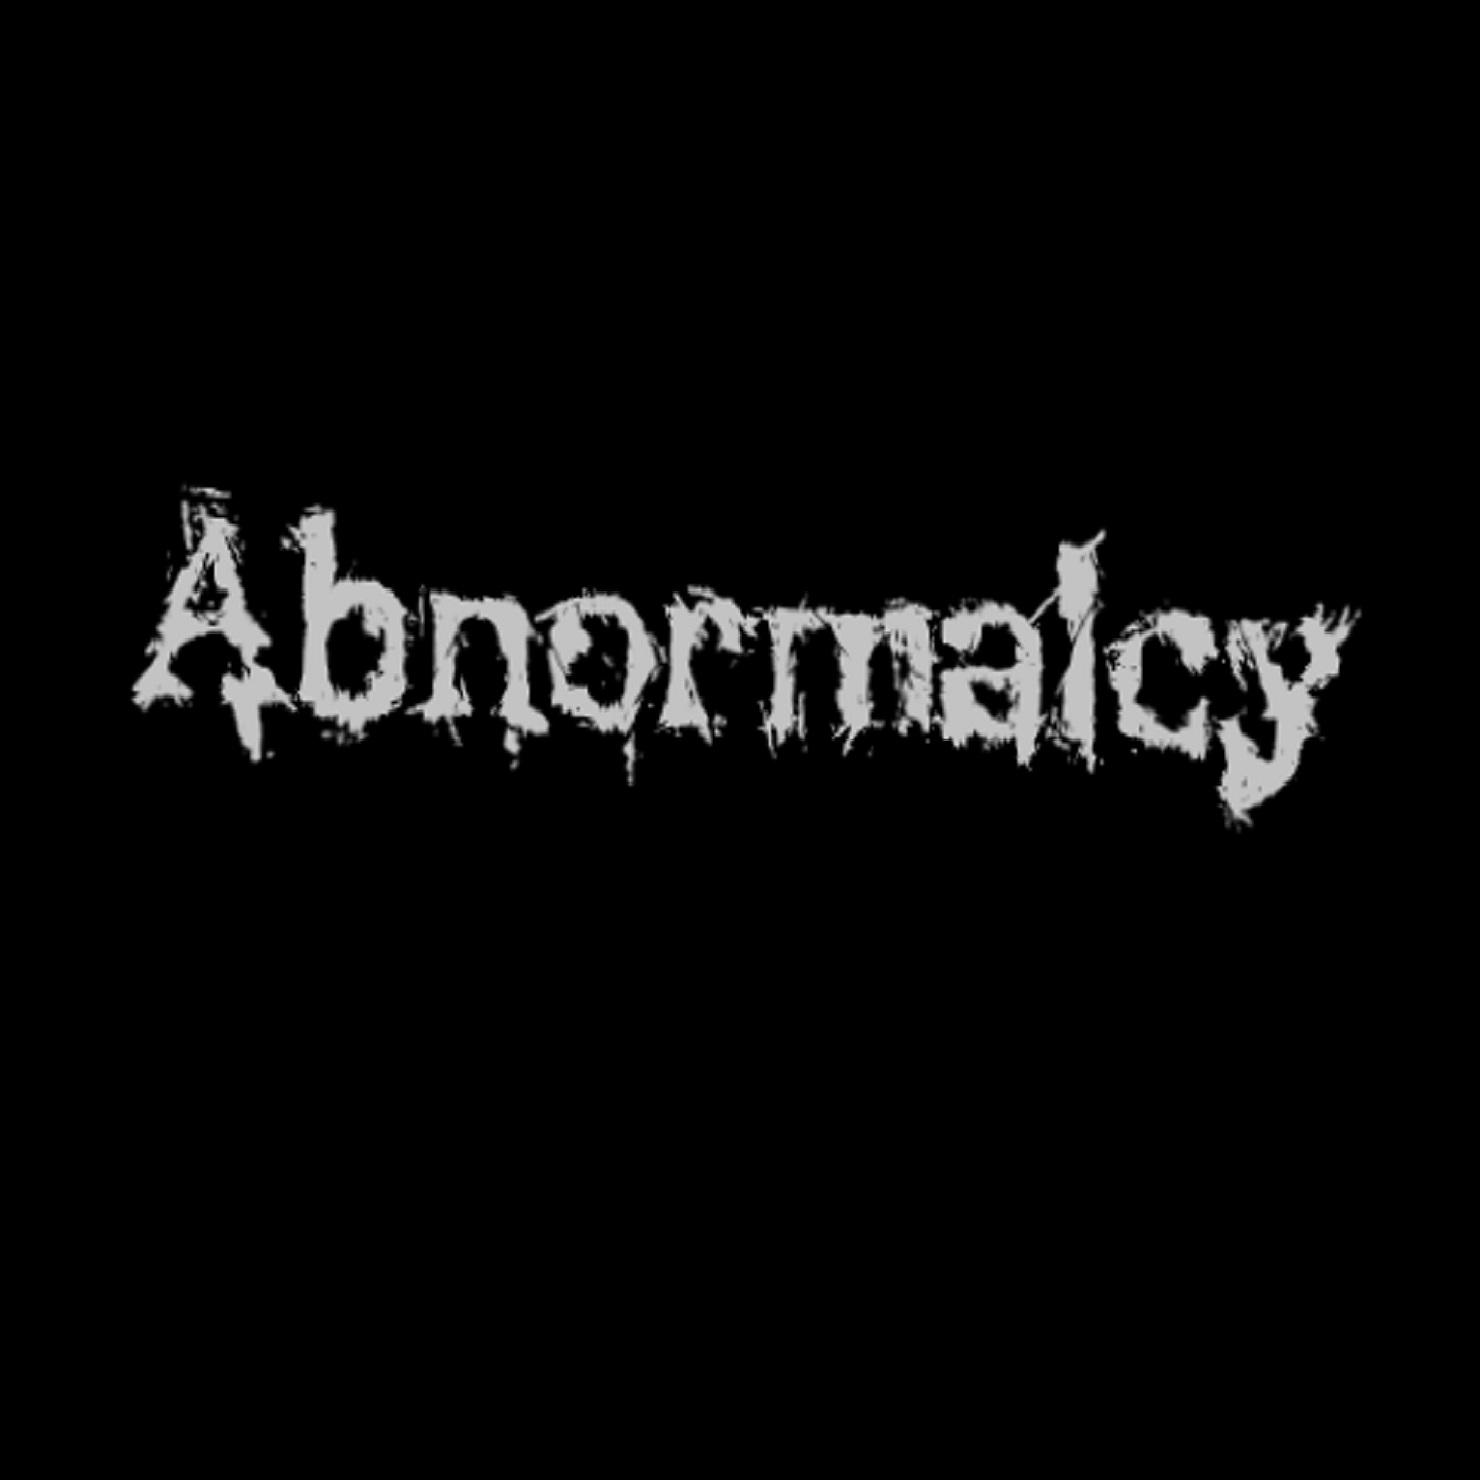 Todd Robbins' Abnormalcy